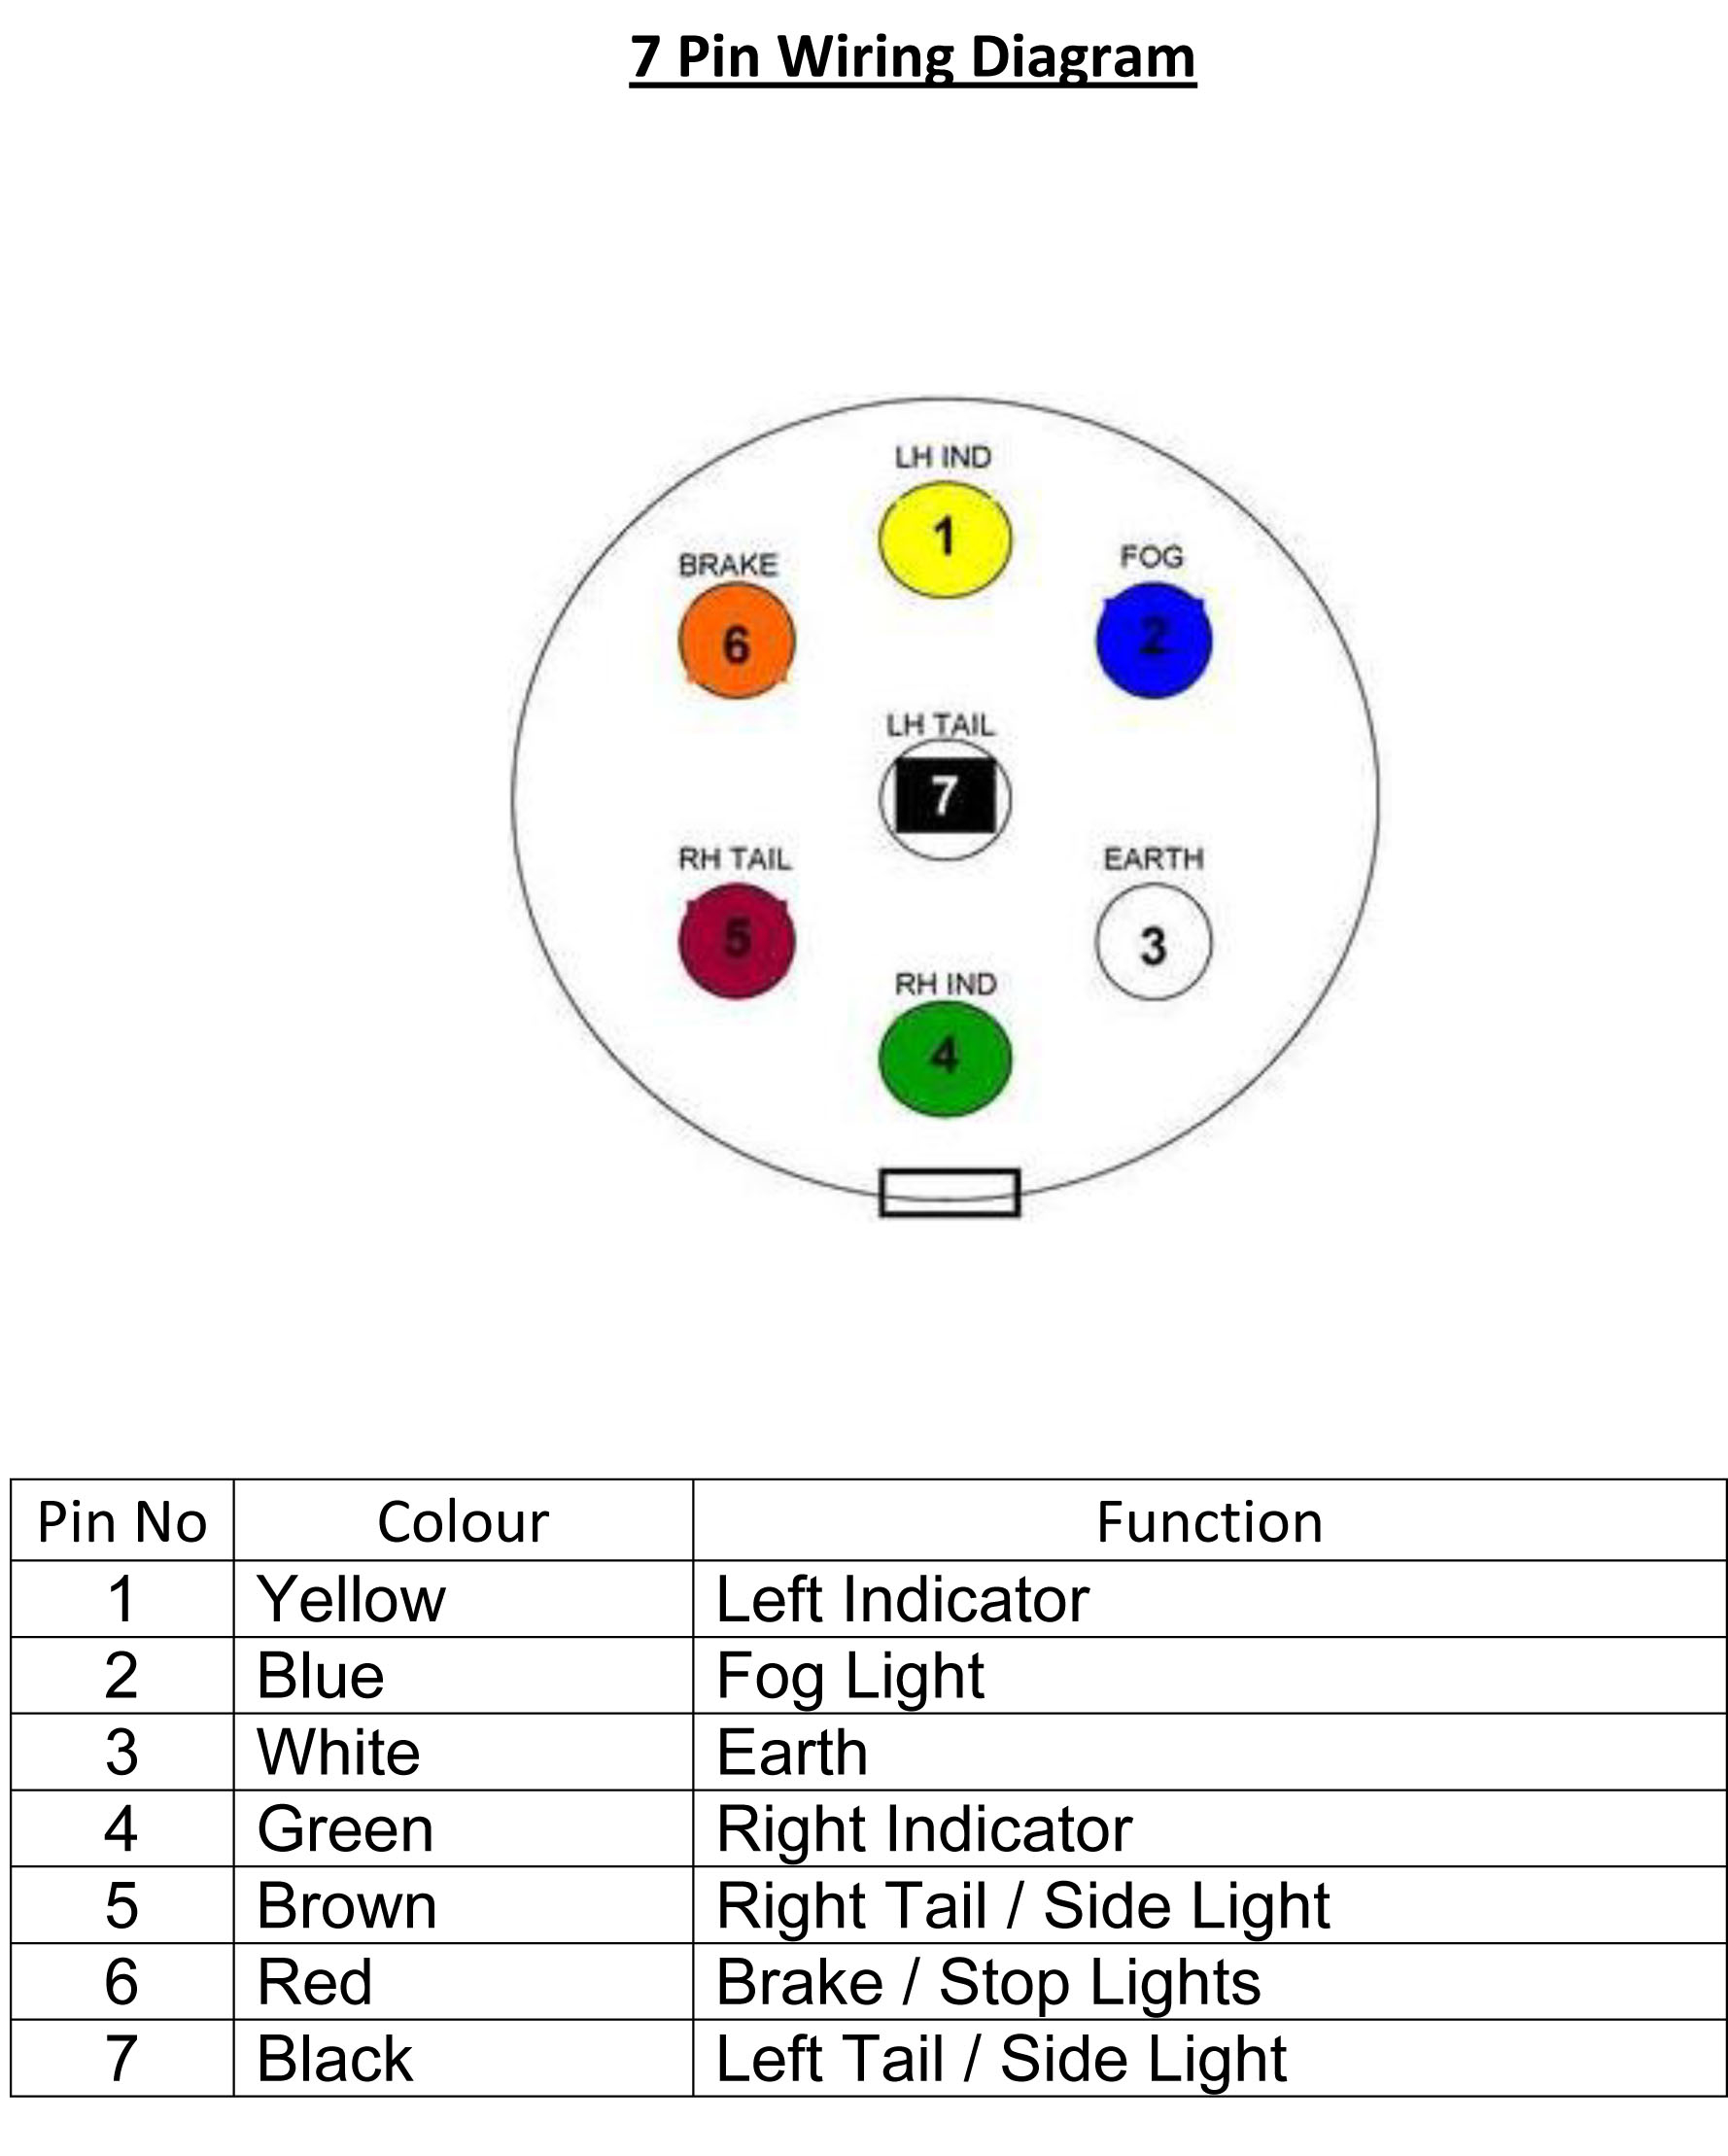 Trailer Light Wiring Diagram Trailer Light Diagram Wiring Diagram Article